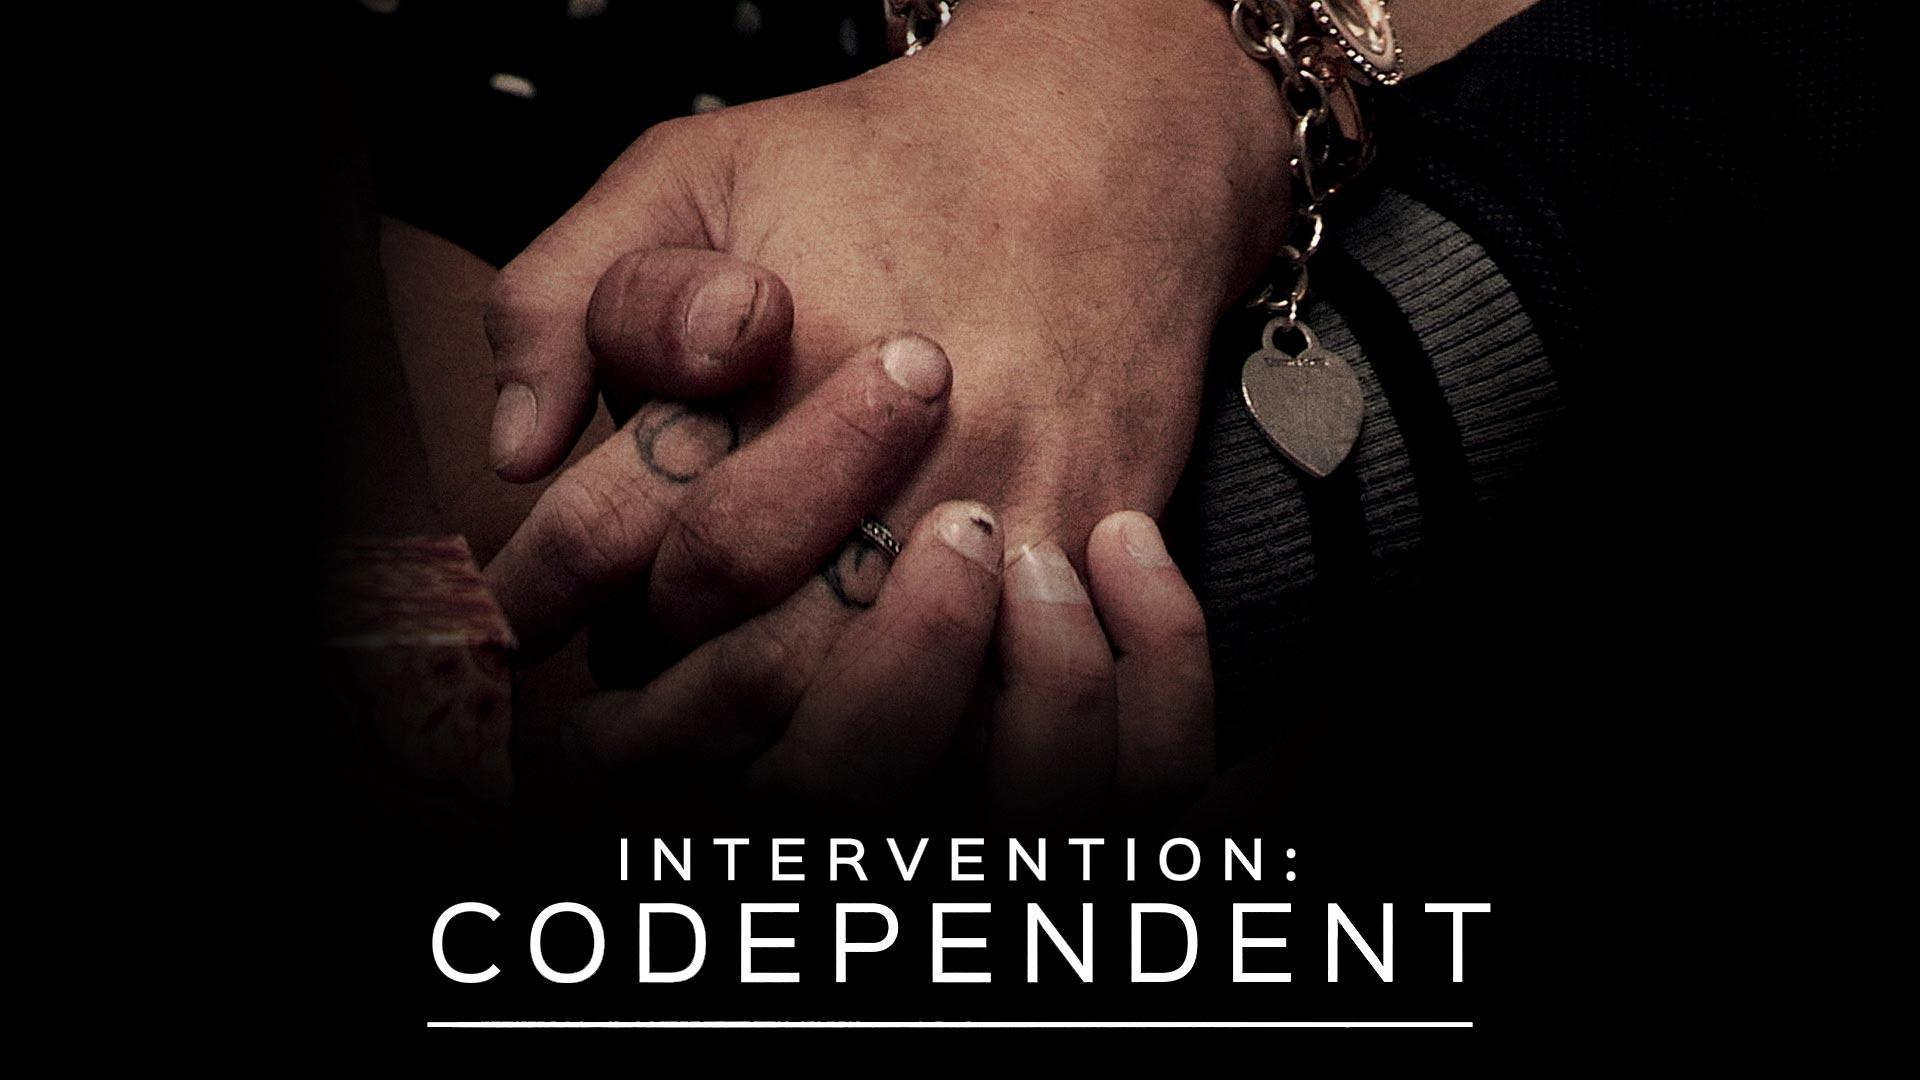 Intervention: Codependent Season 1